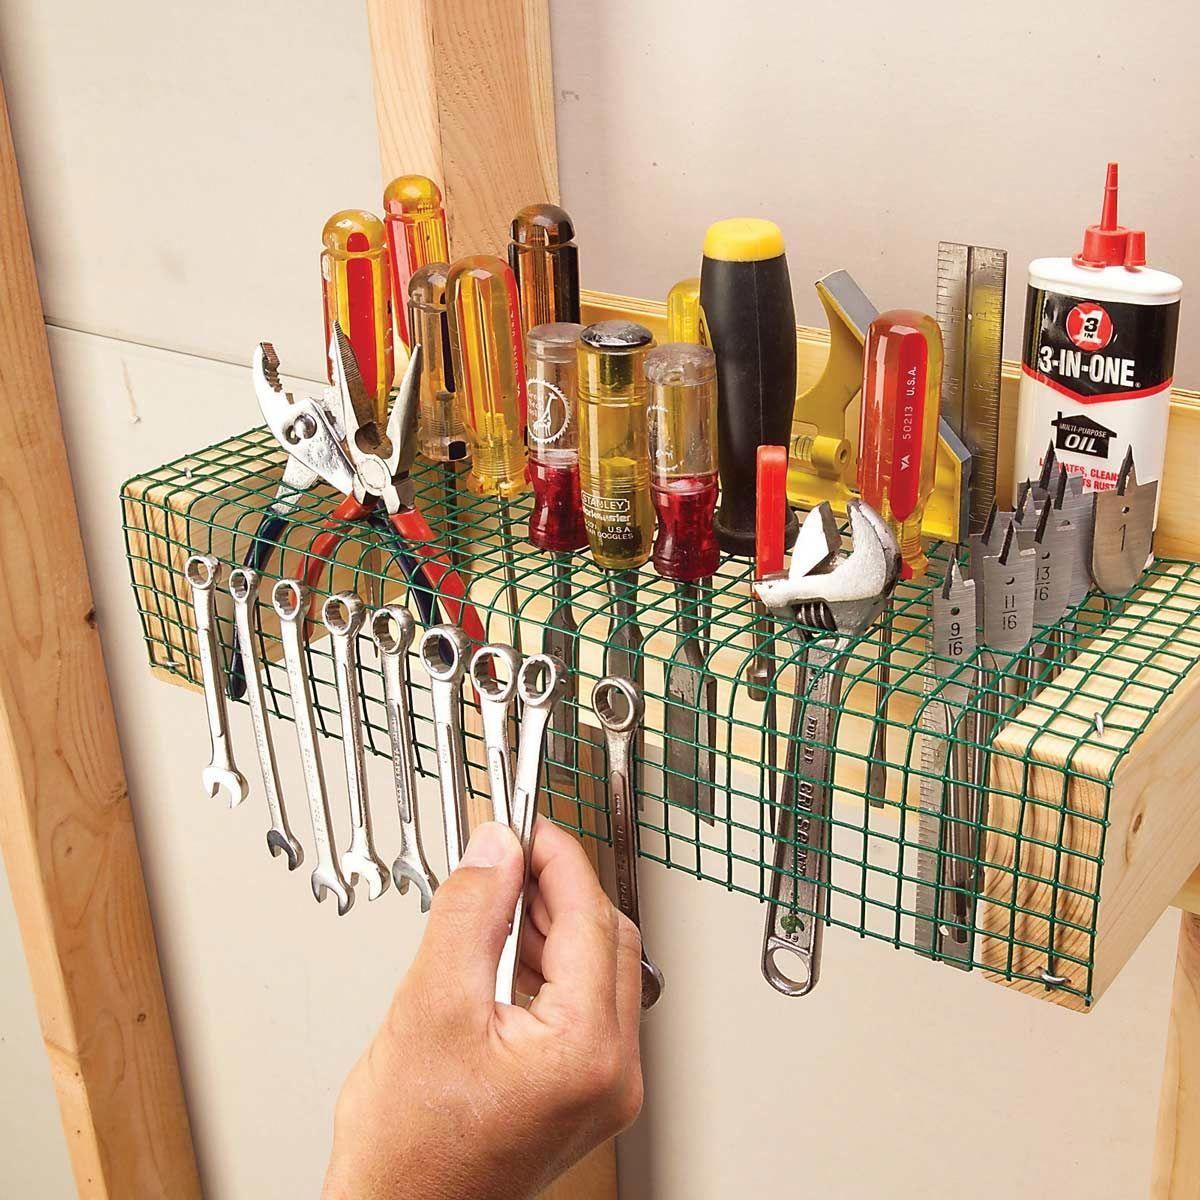 Организация инструментов фото 3